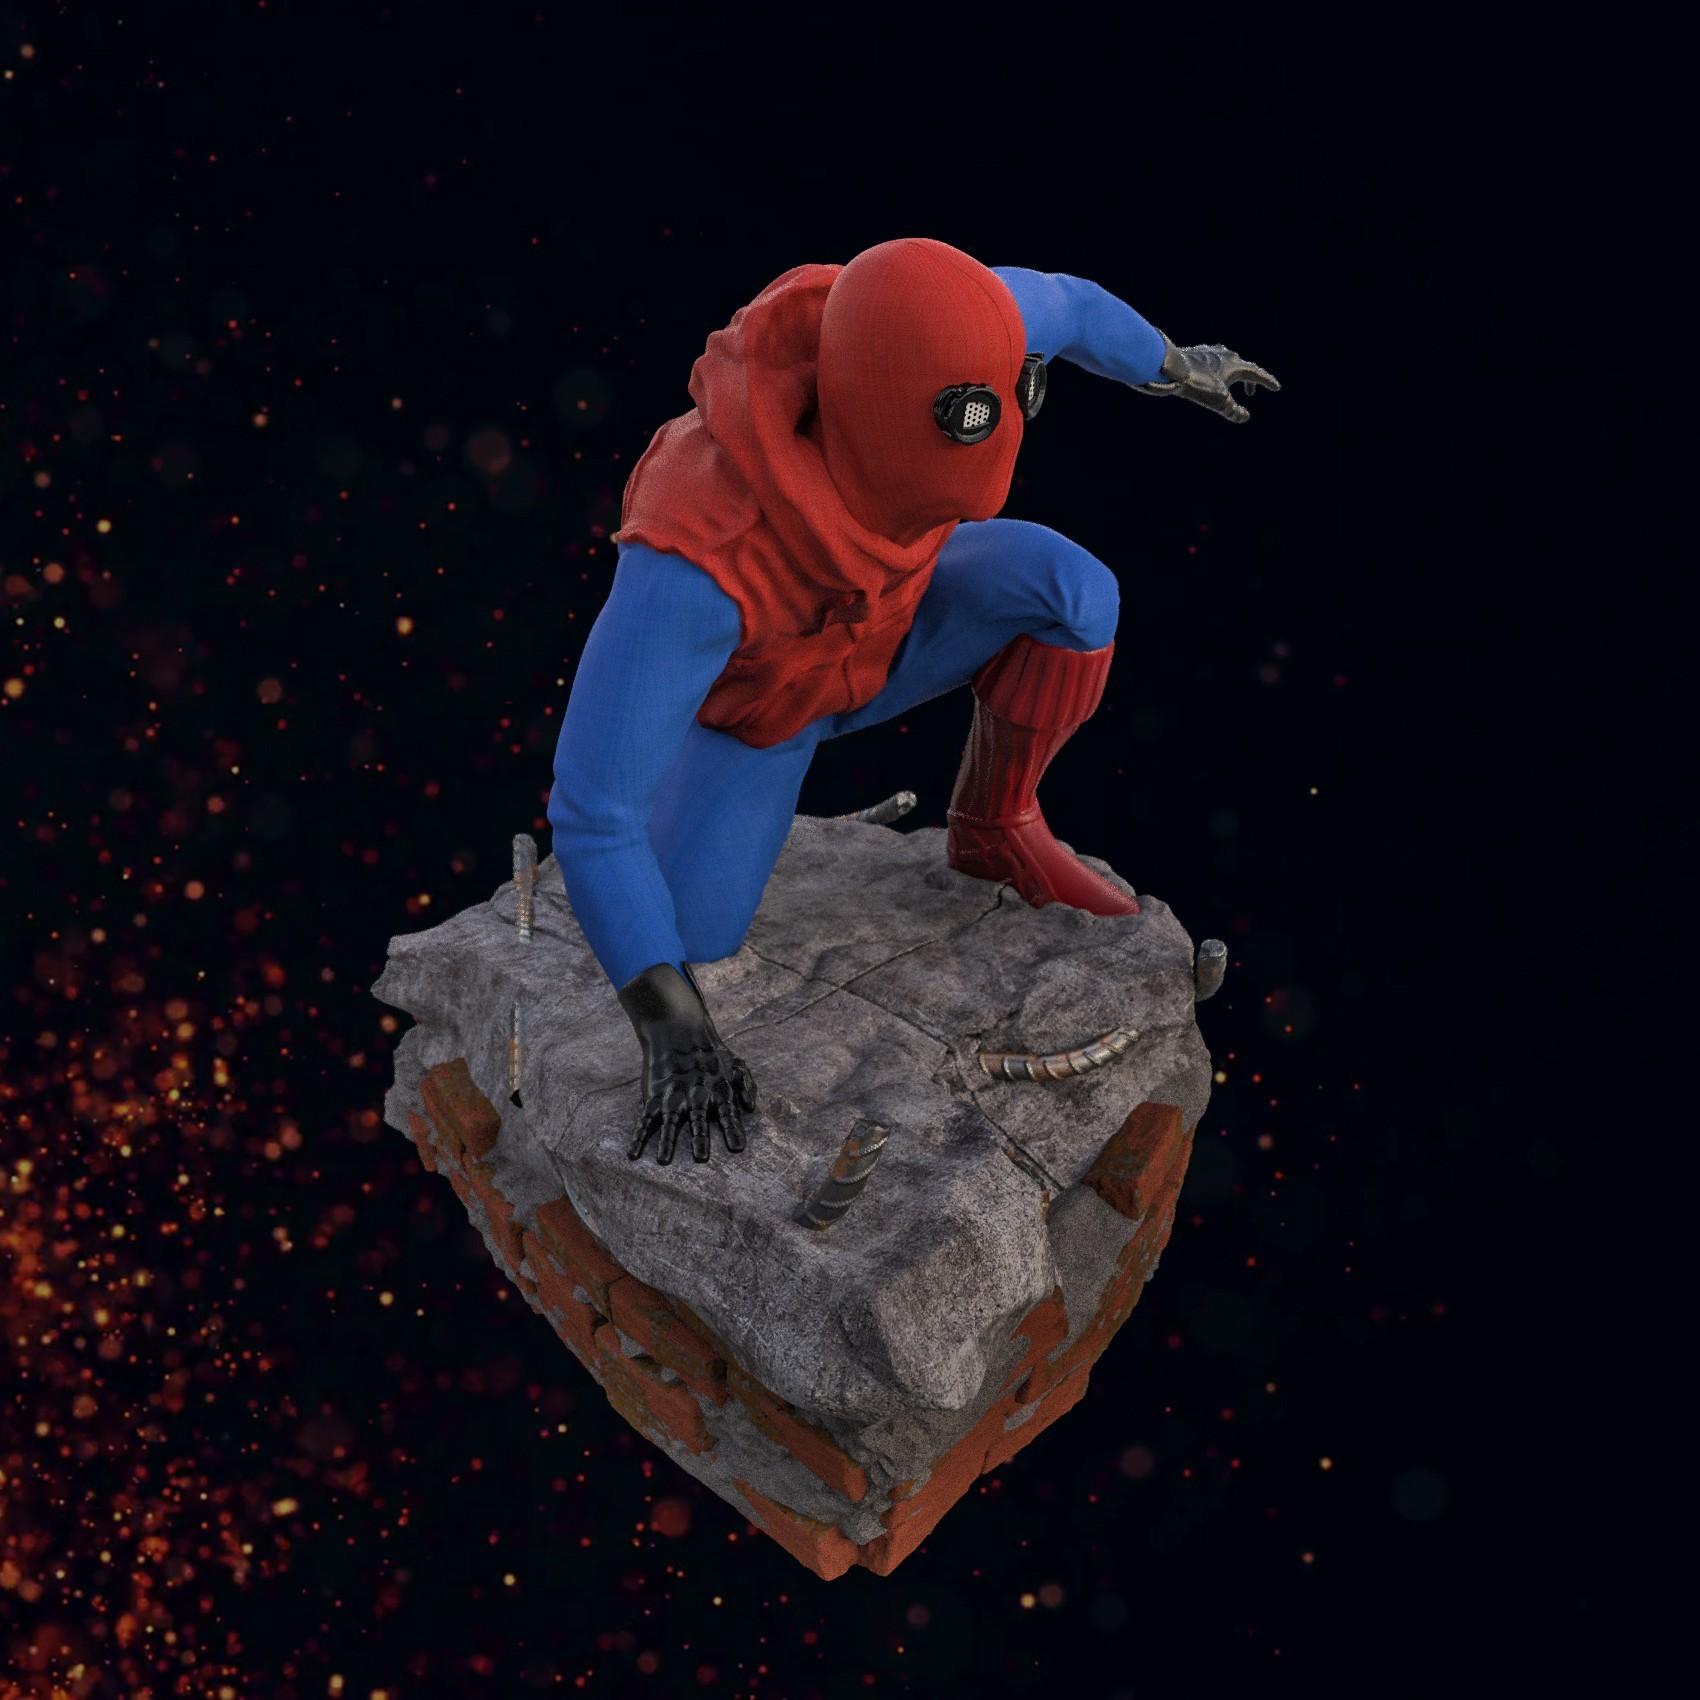 6.jpg Download STL file Spider-Man Homemade Suit • Design to 3D print, tolgaaxu